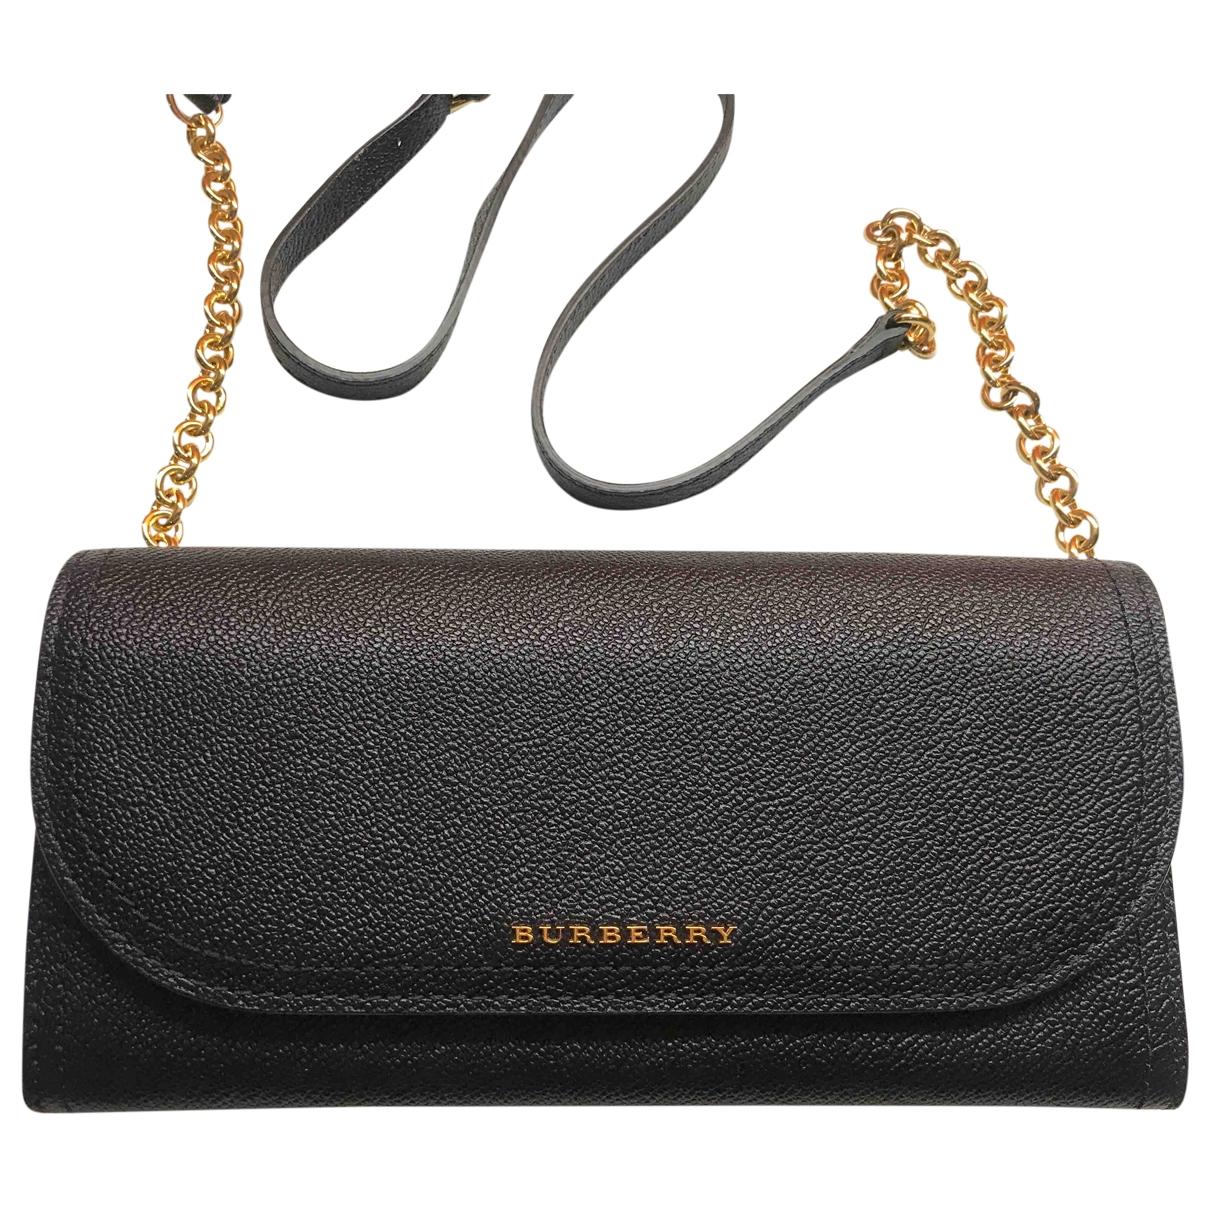 Burberry \N Clutch in  Schwarz Leder